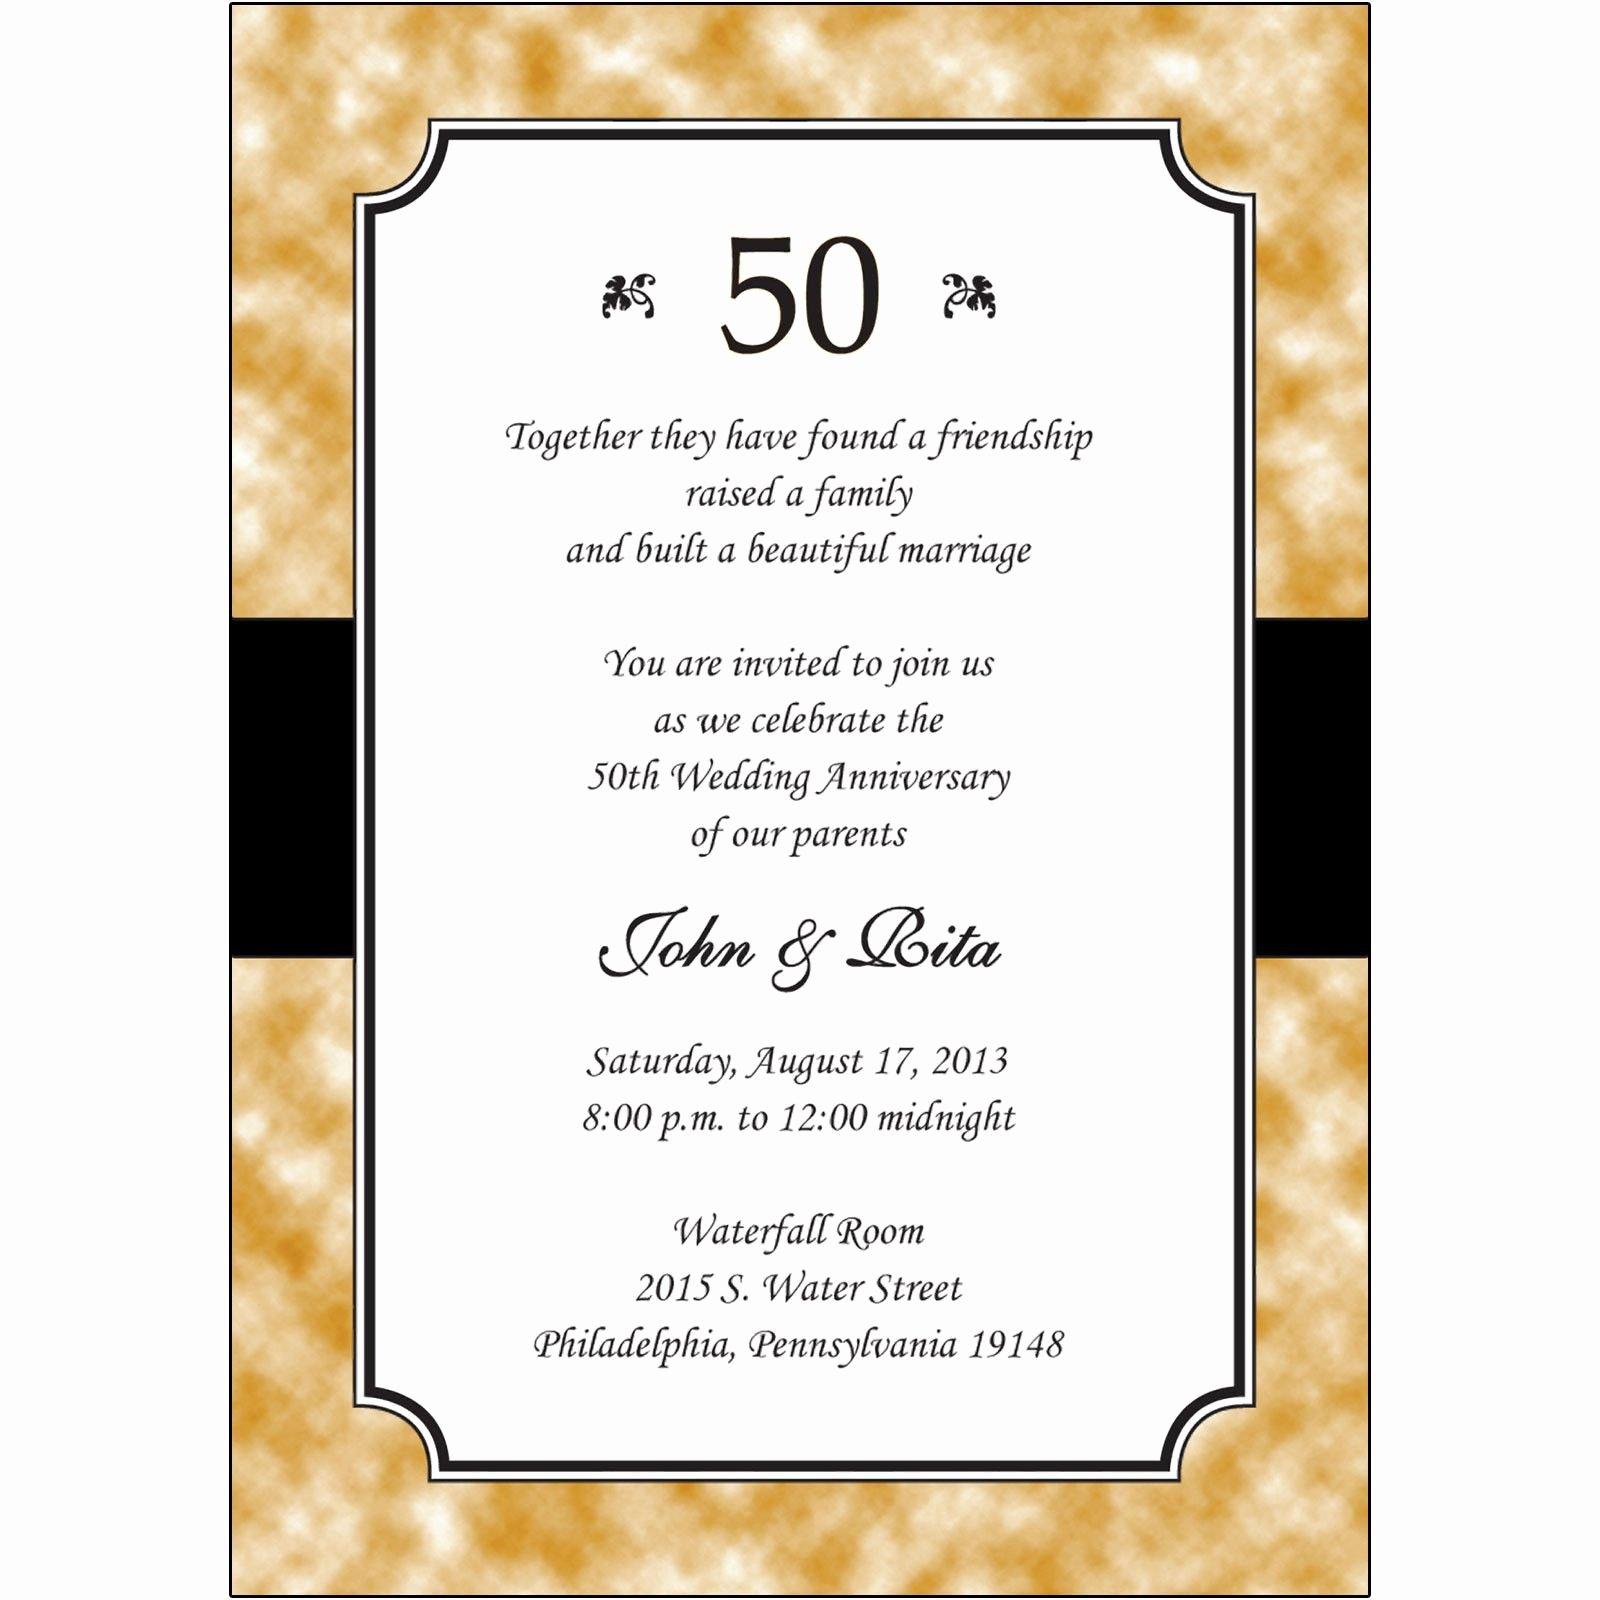 50th Anniversary Invitations Templates Beautiful Personalized 50th Anniversary Invitations